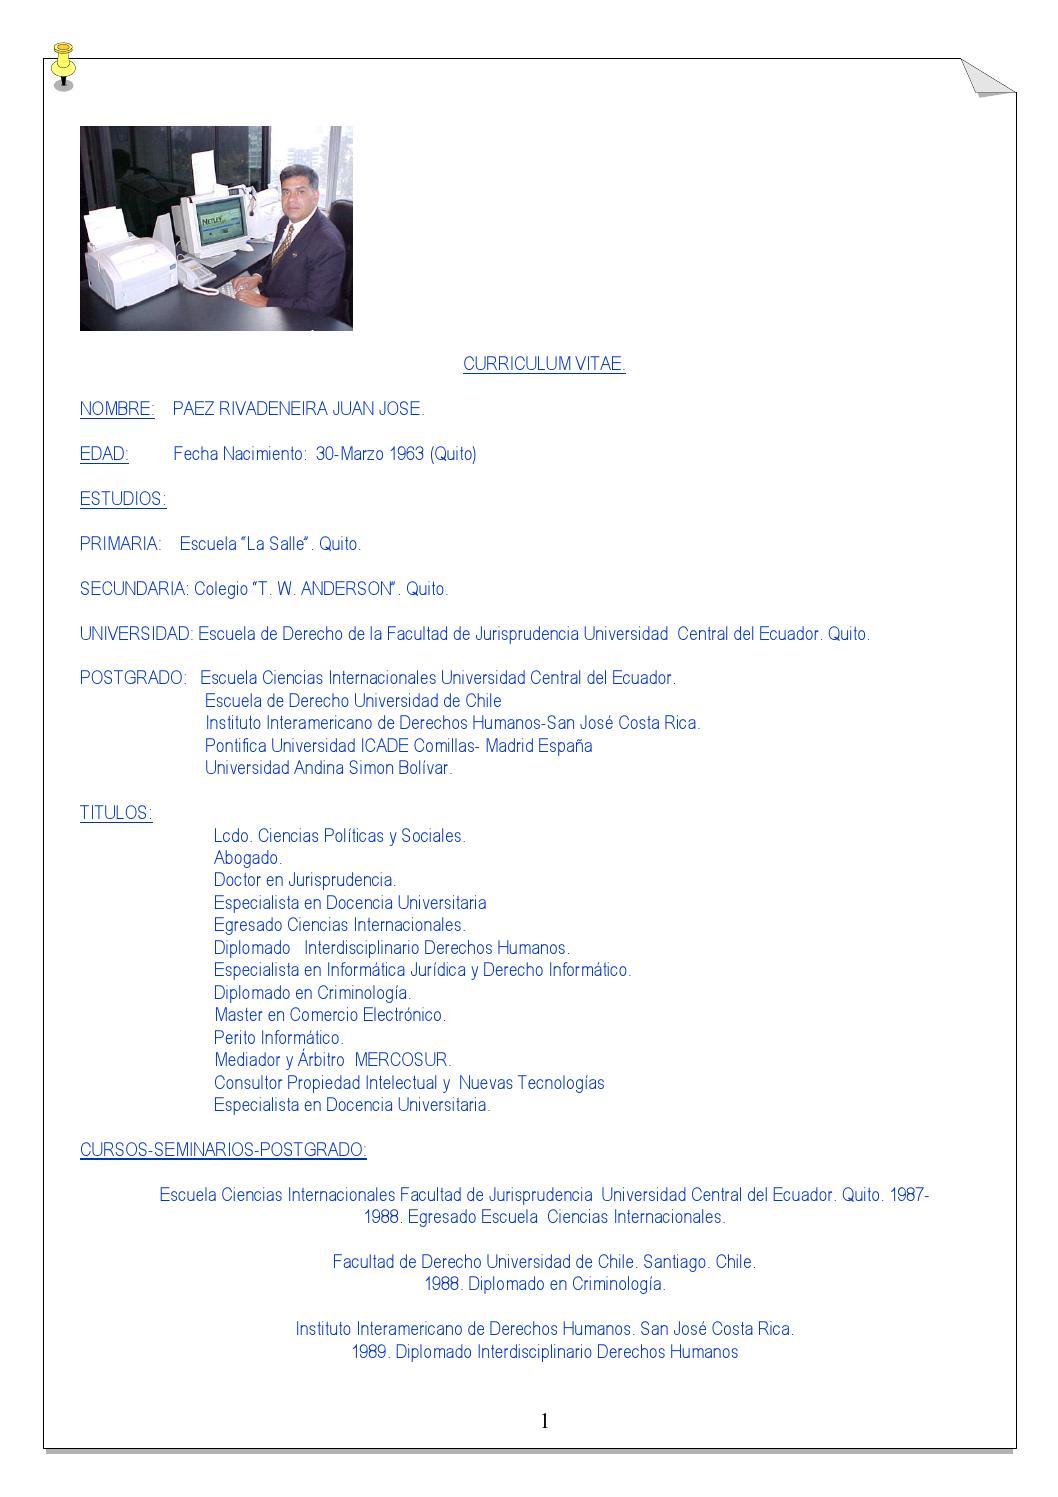 Curriculum drpaez by Juan Jose Paez Rivadeneira - issuu